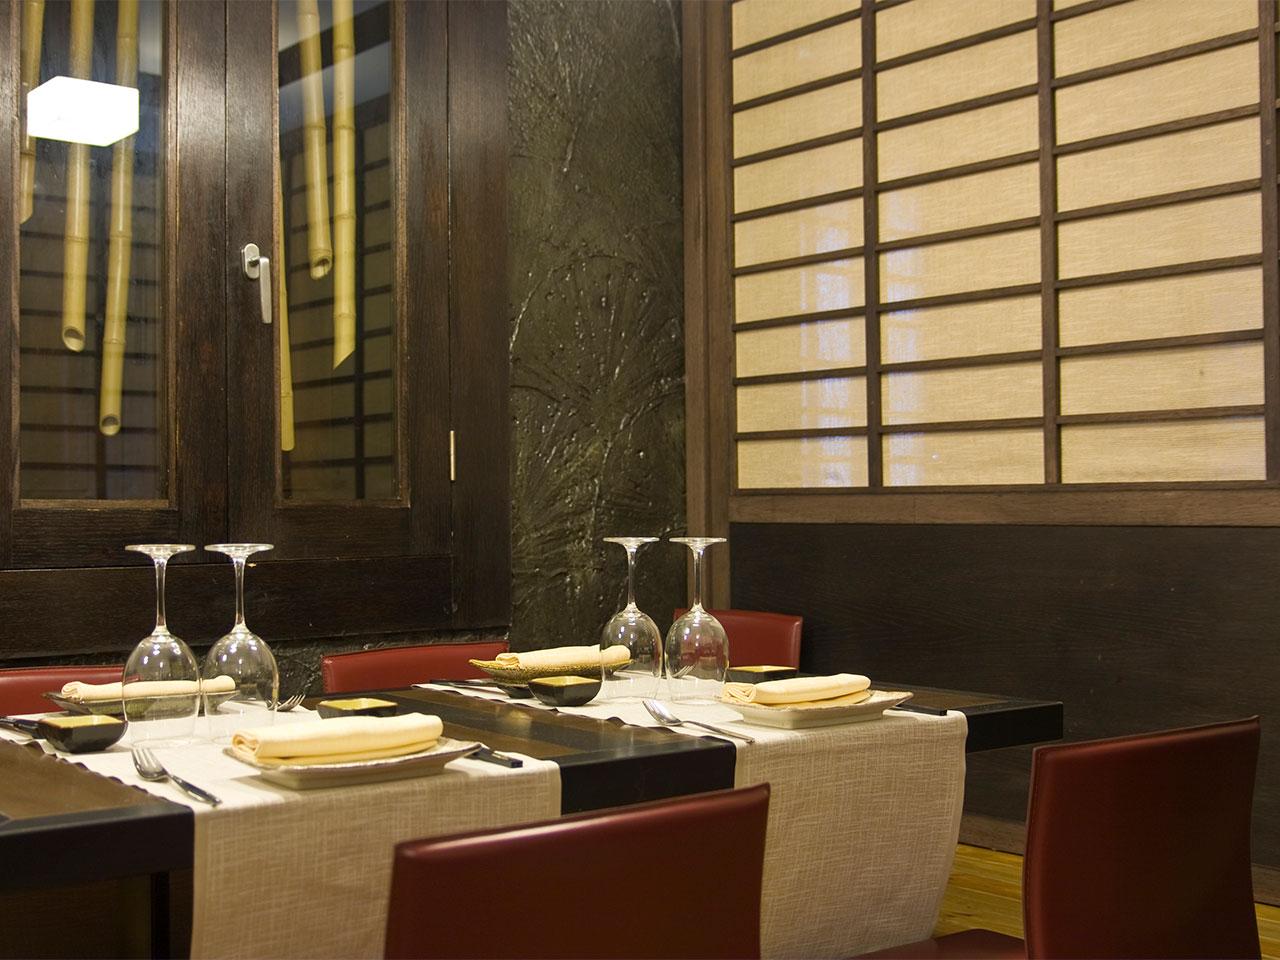 ristorante-giapponese-hiro-japanese-restaurant-rho-3